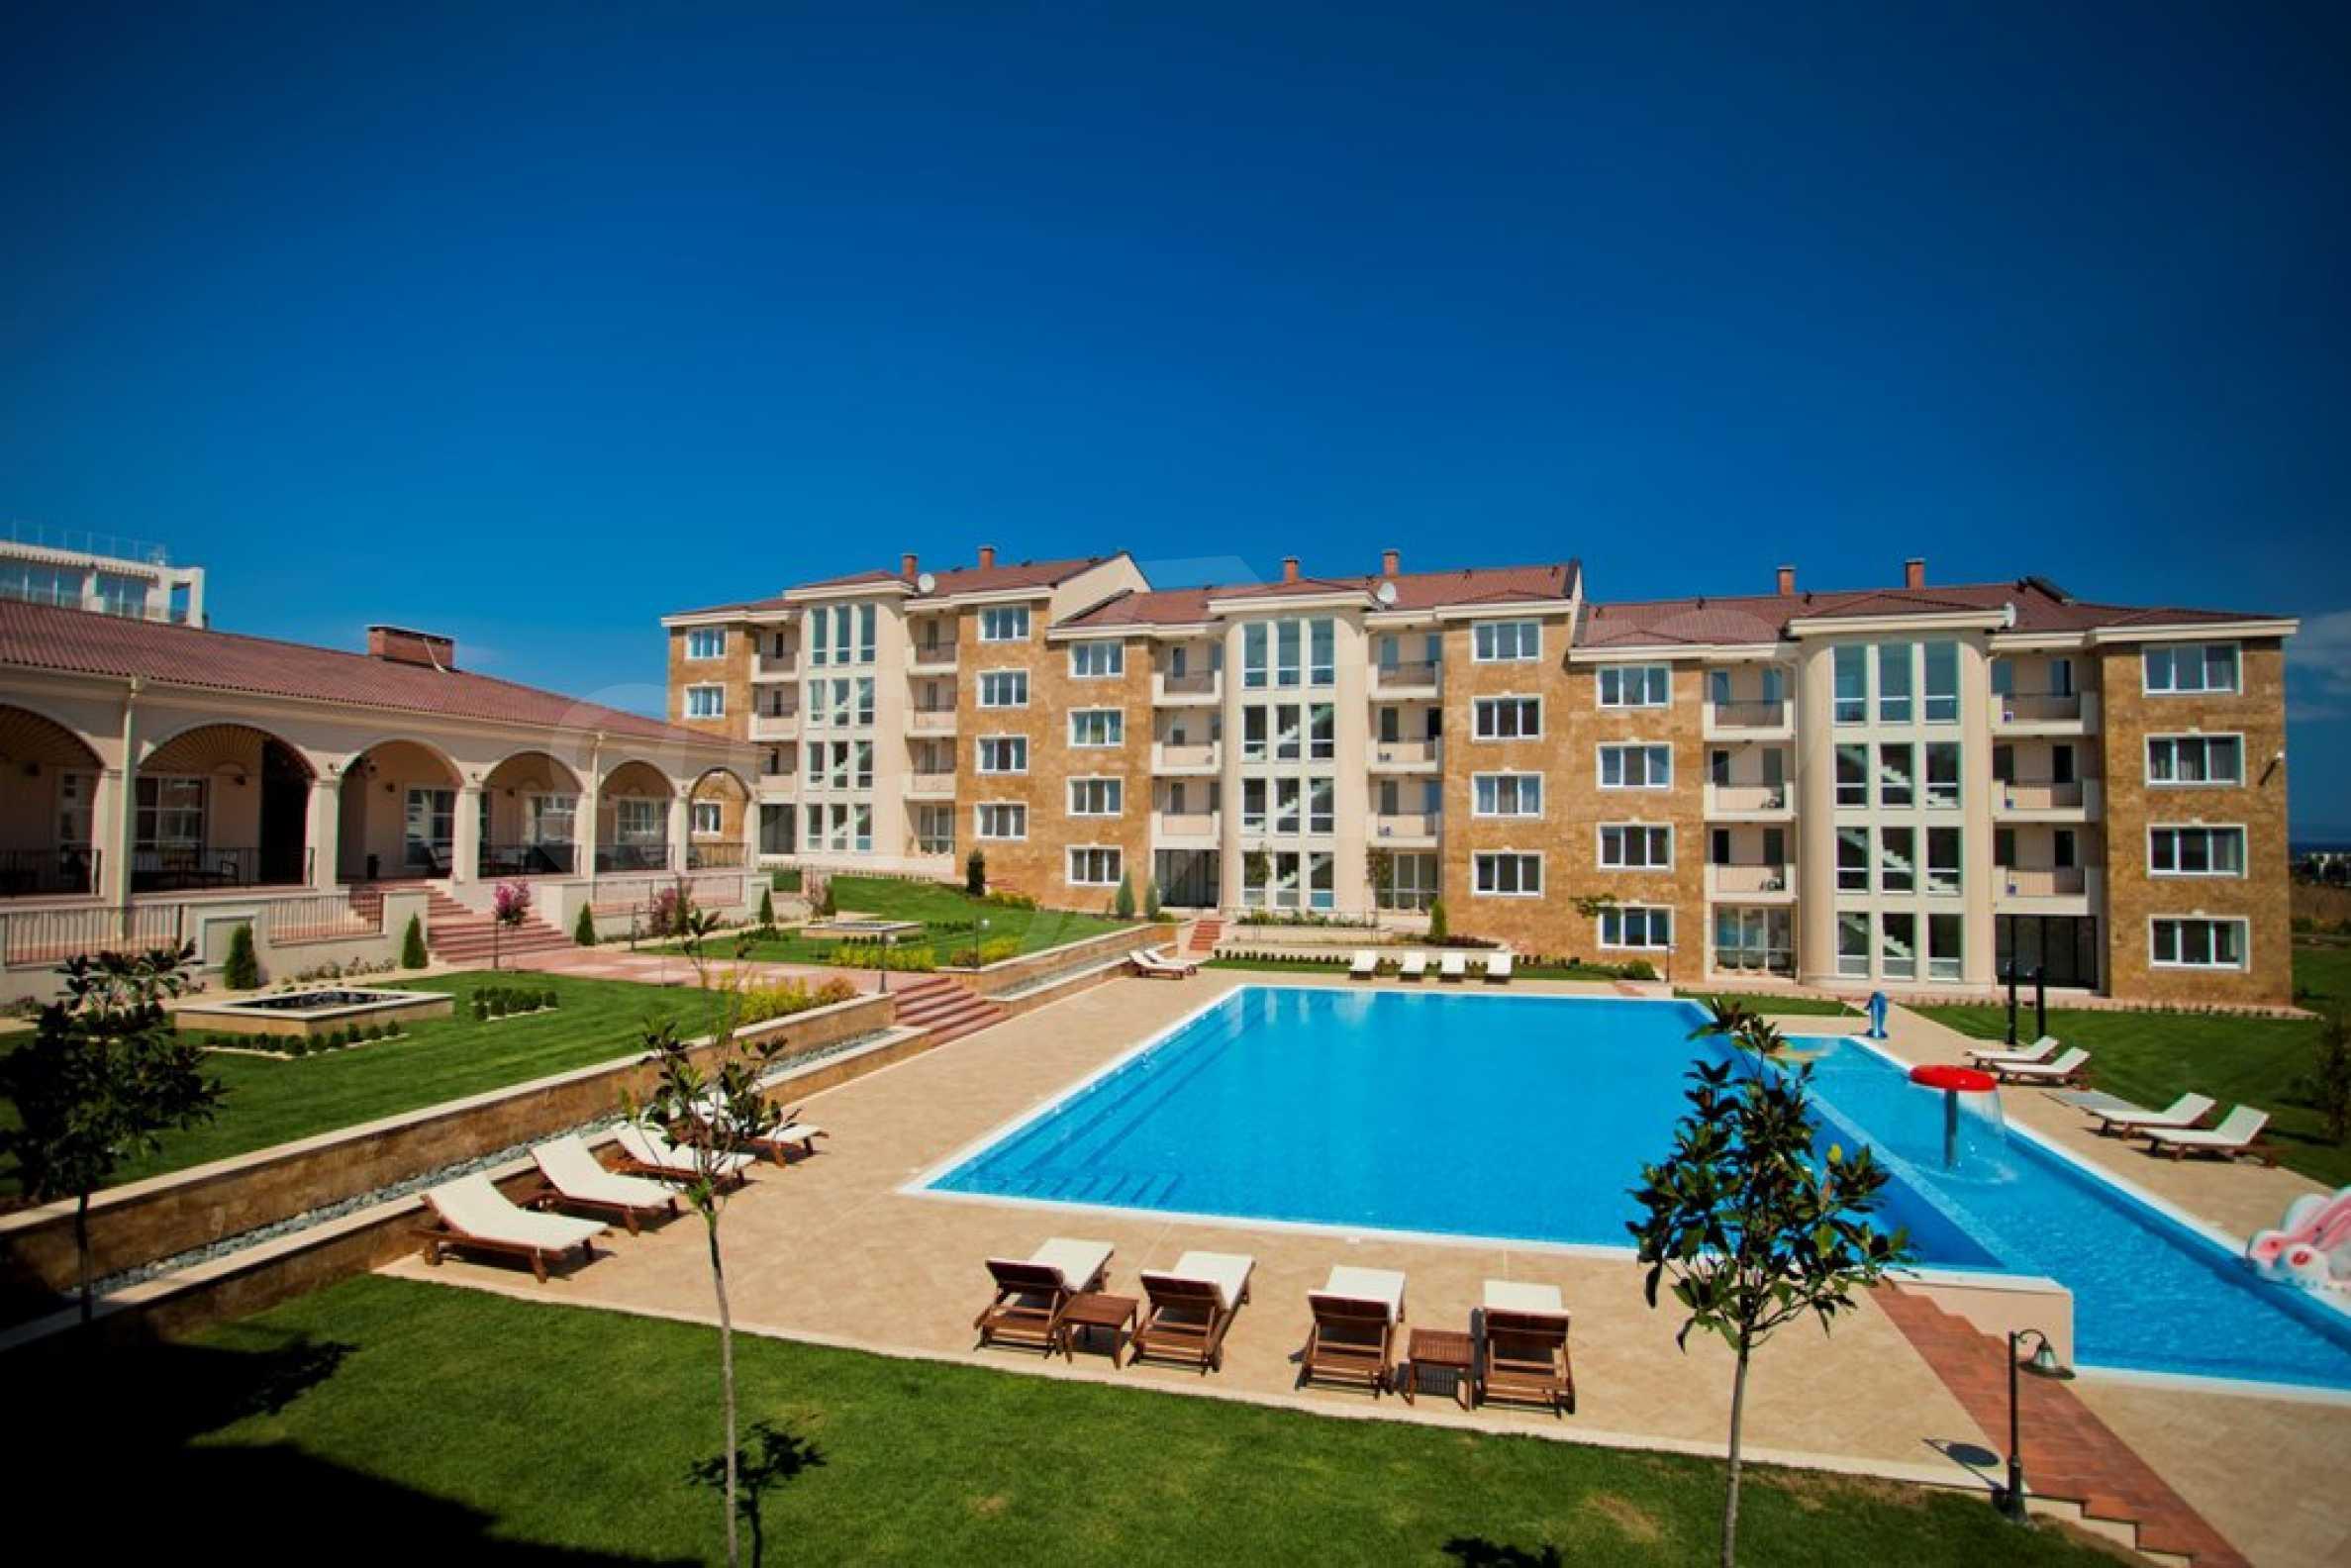 New apartment complex Atia resort in Chernomorets 3